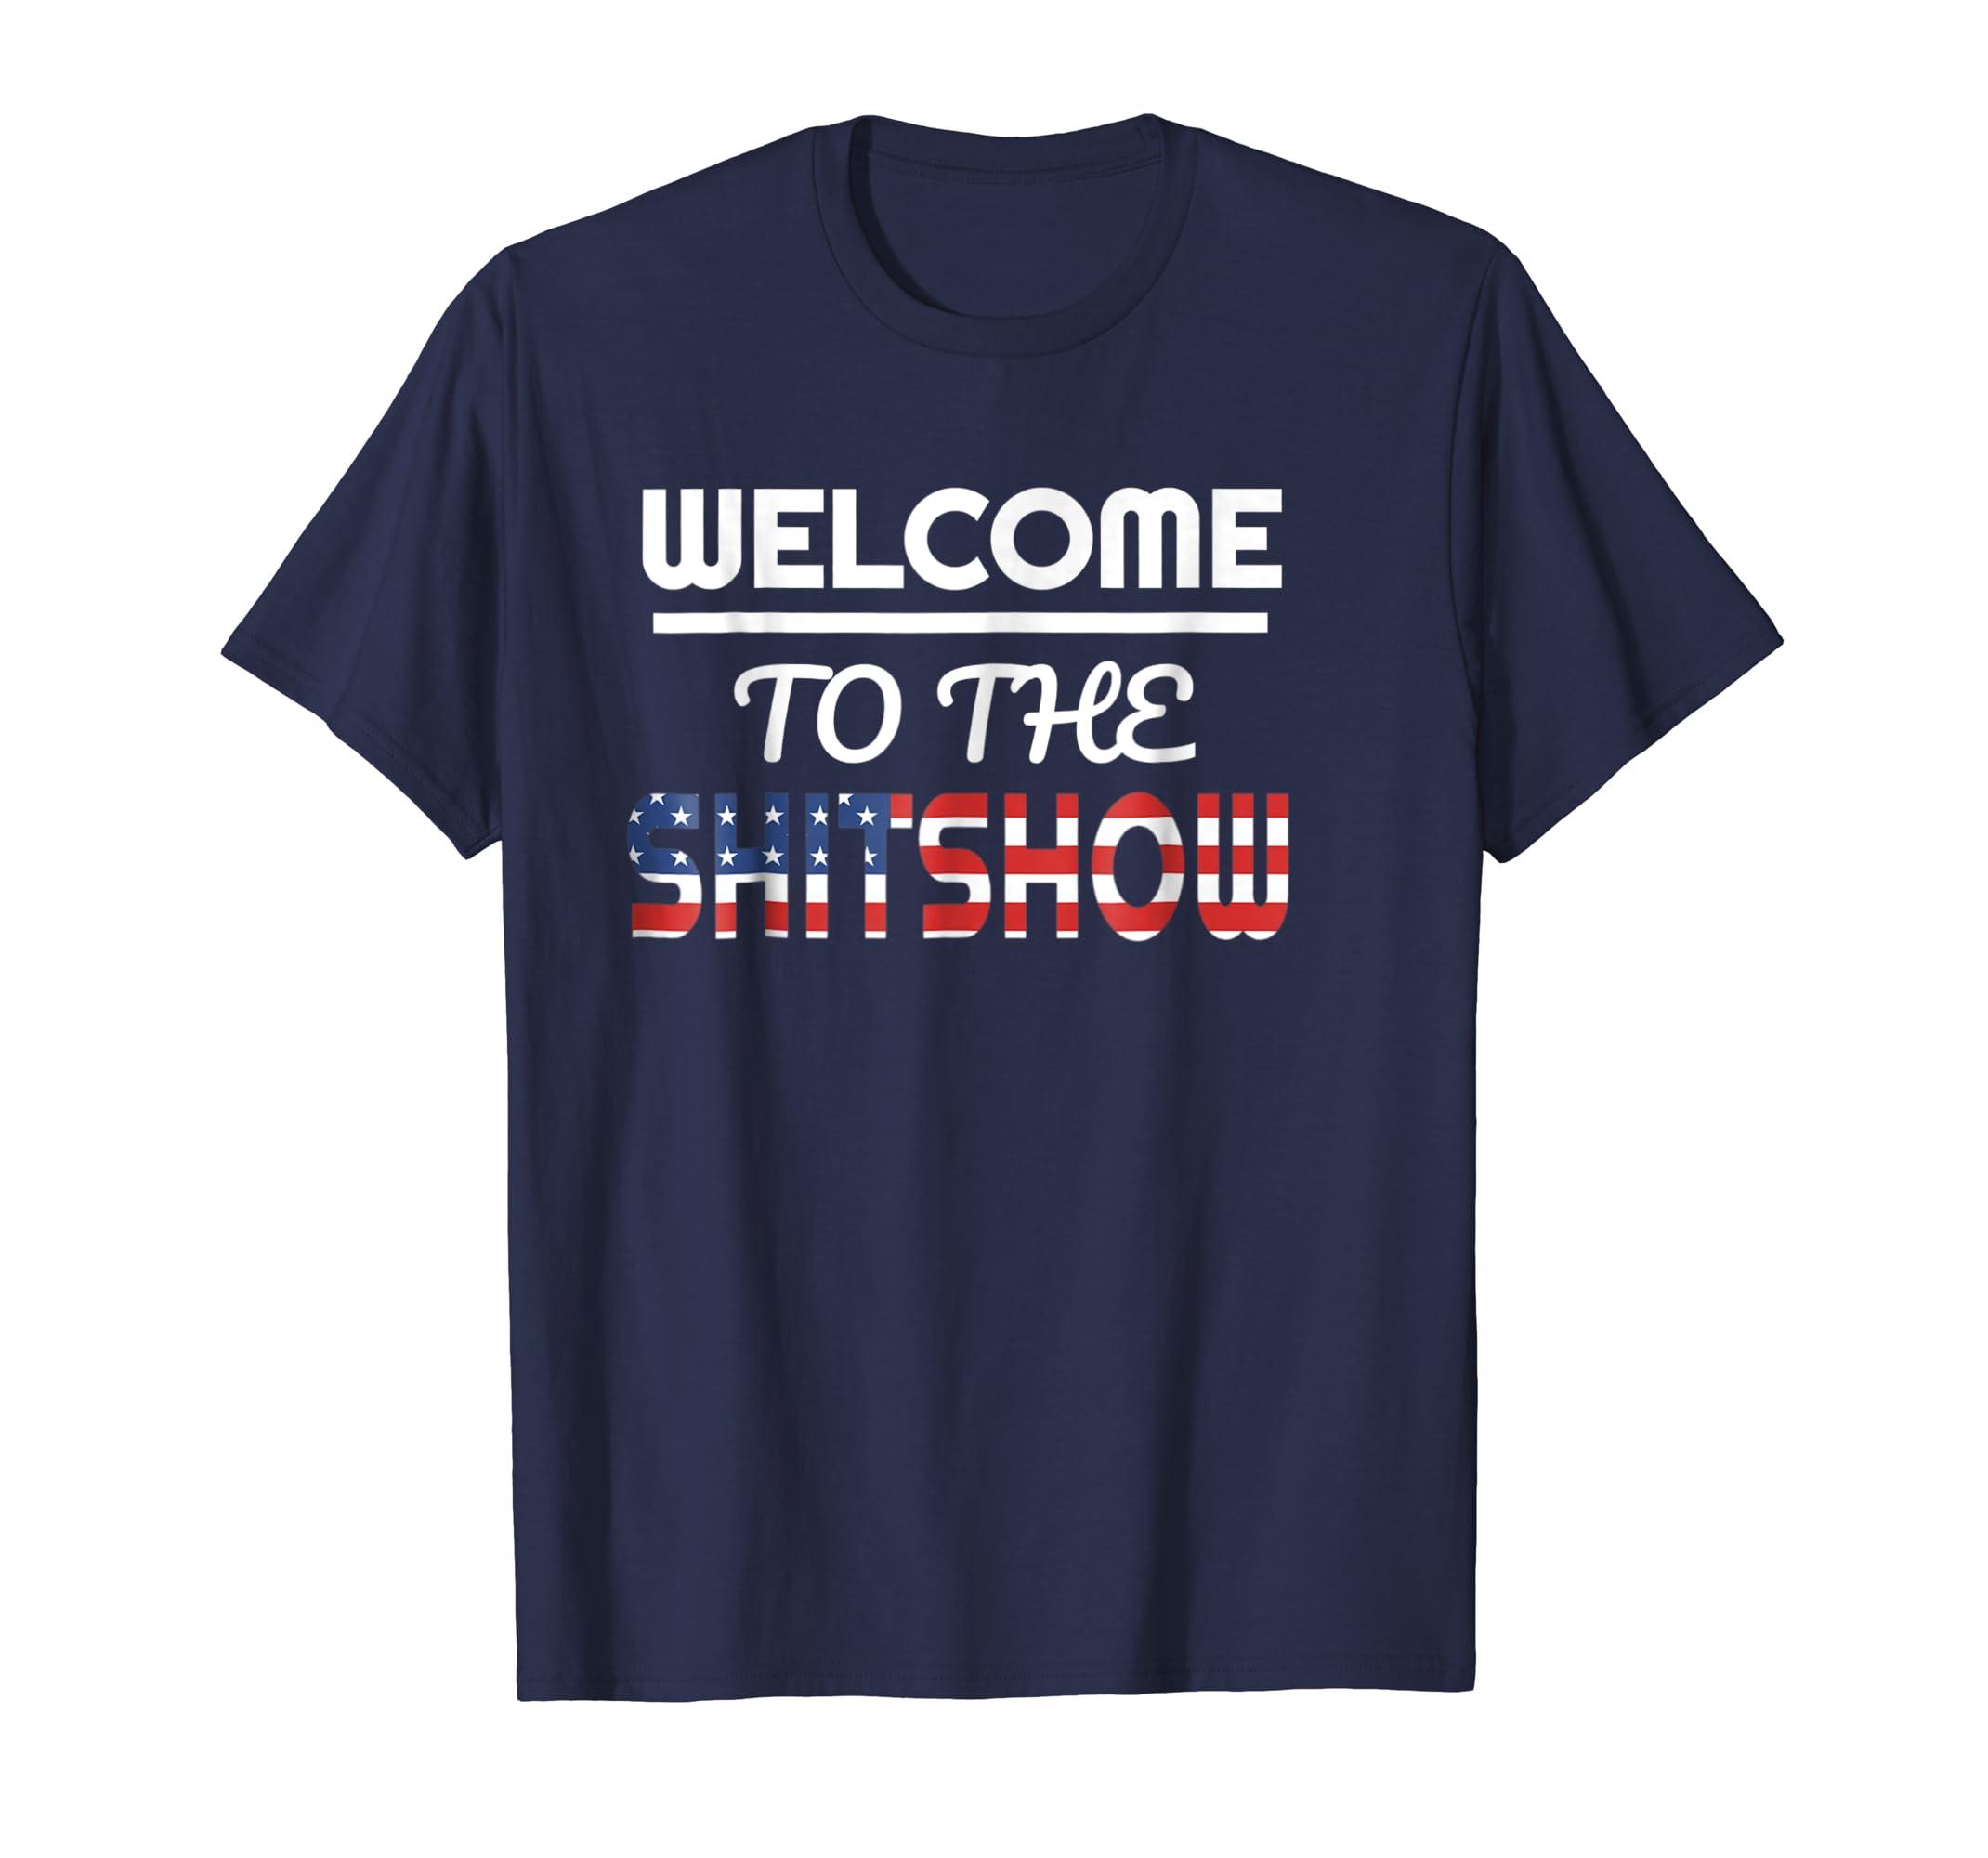 Funny Welcome to the Shitshow Meme Shirt Gift for Men Women-Teesml